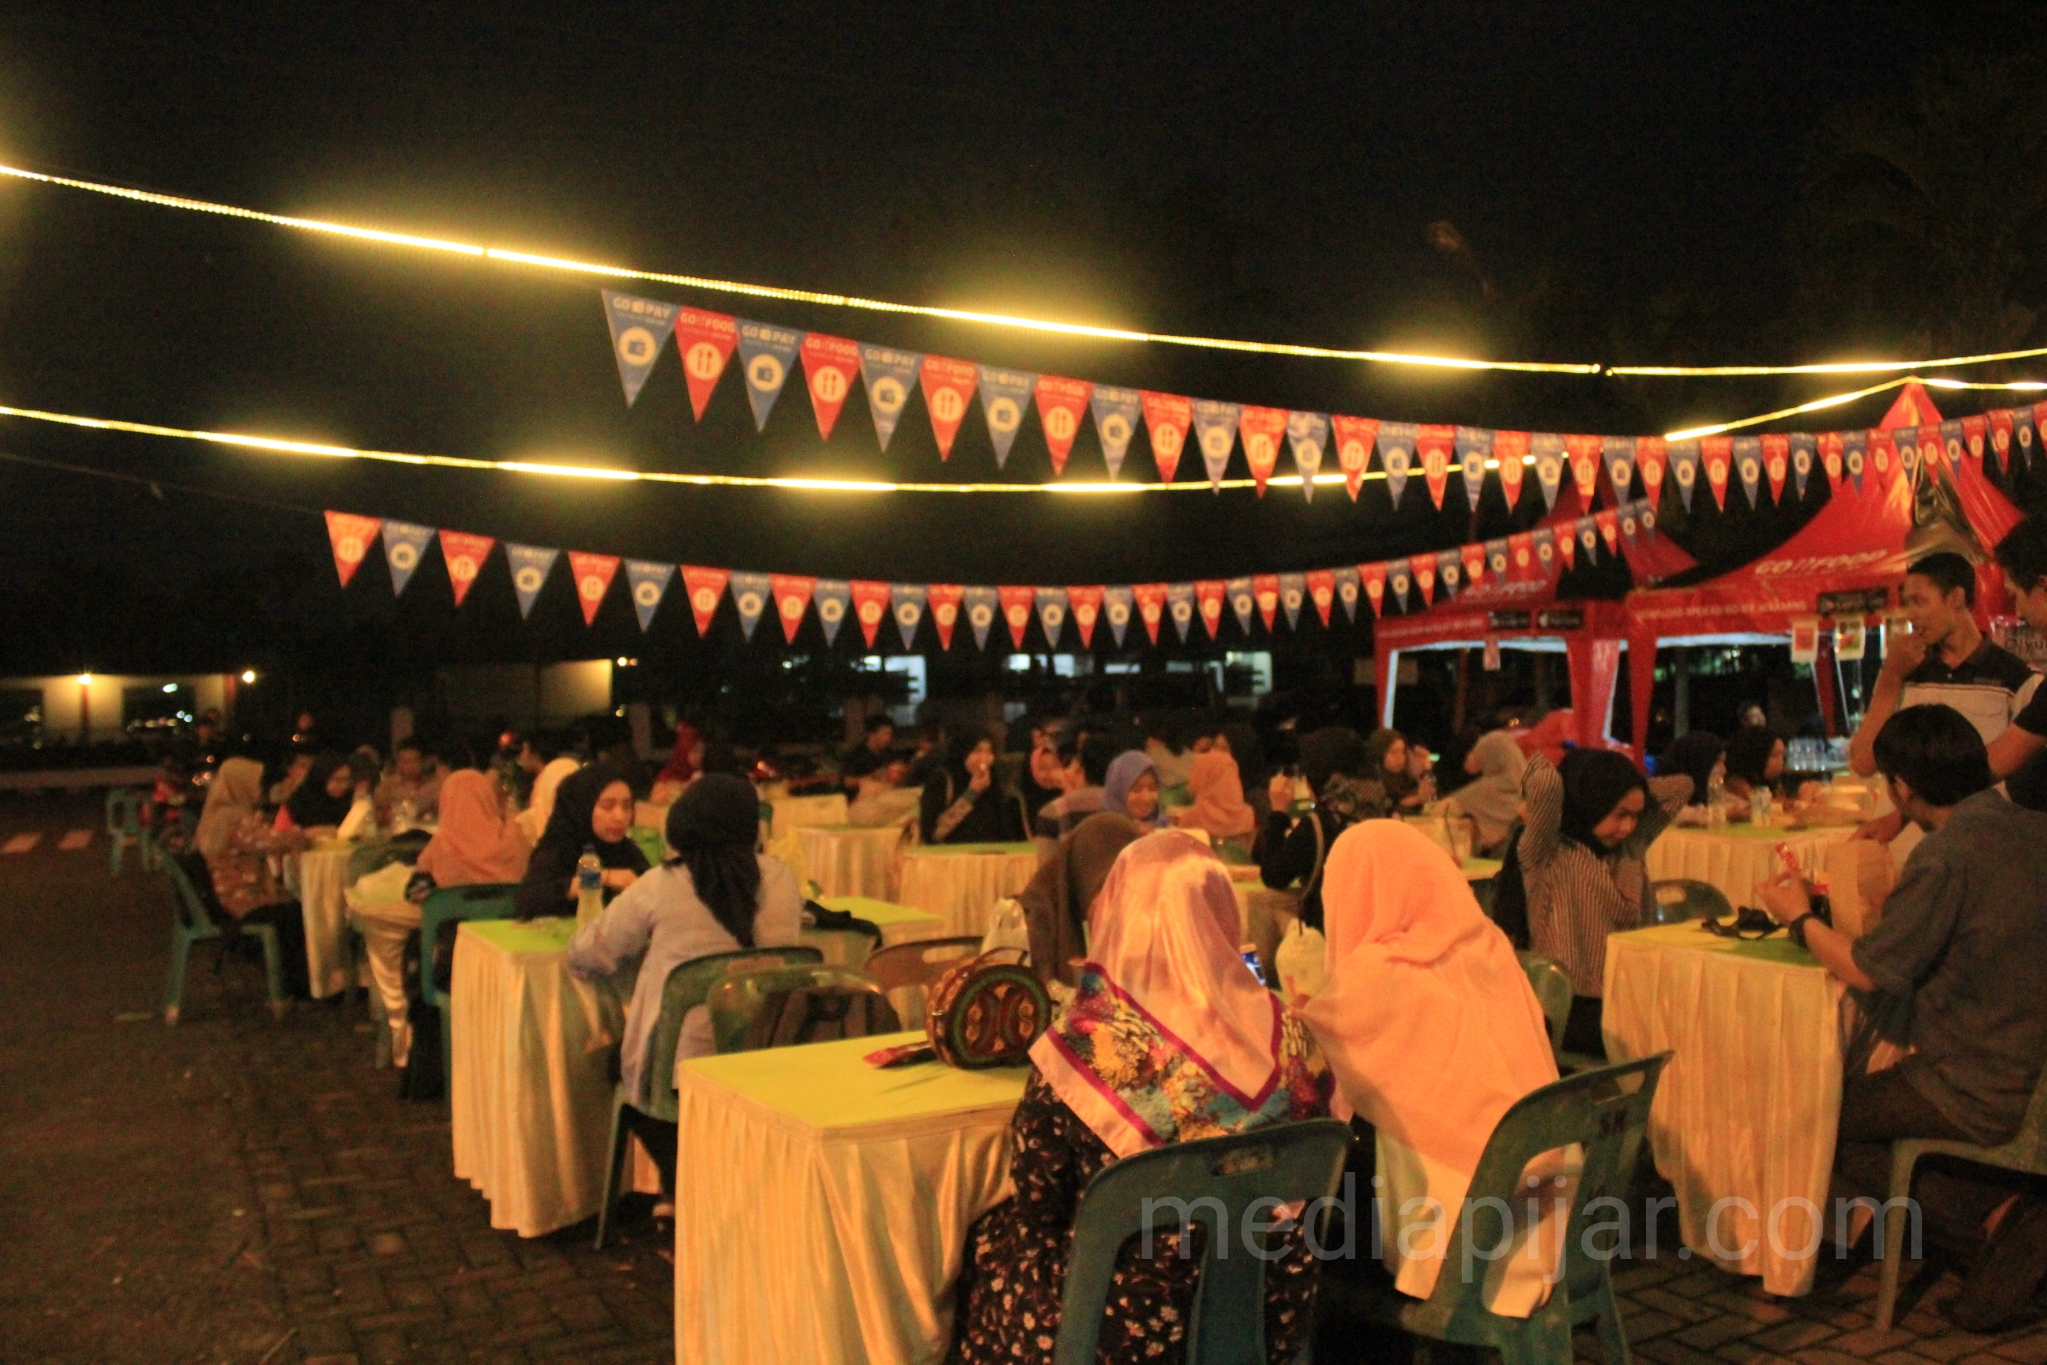 Suasana bazaar acara Ramadhan Fest pada malam hari di Gedung Pancasila Pendopo USU. (16/5)  (Fotografer: Indah Ramadhanti)